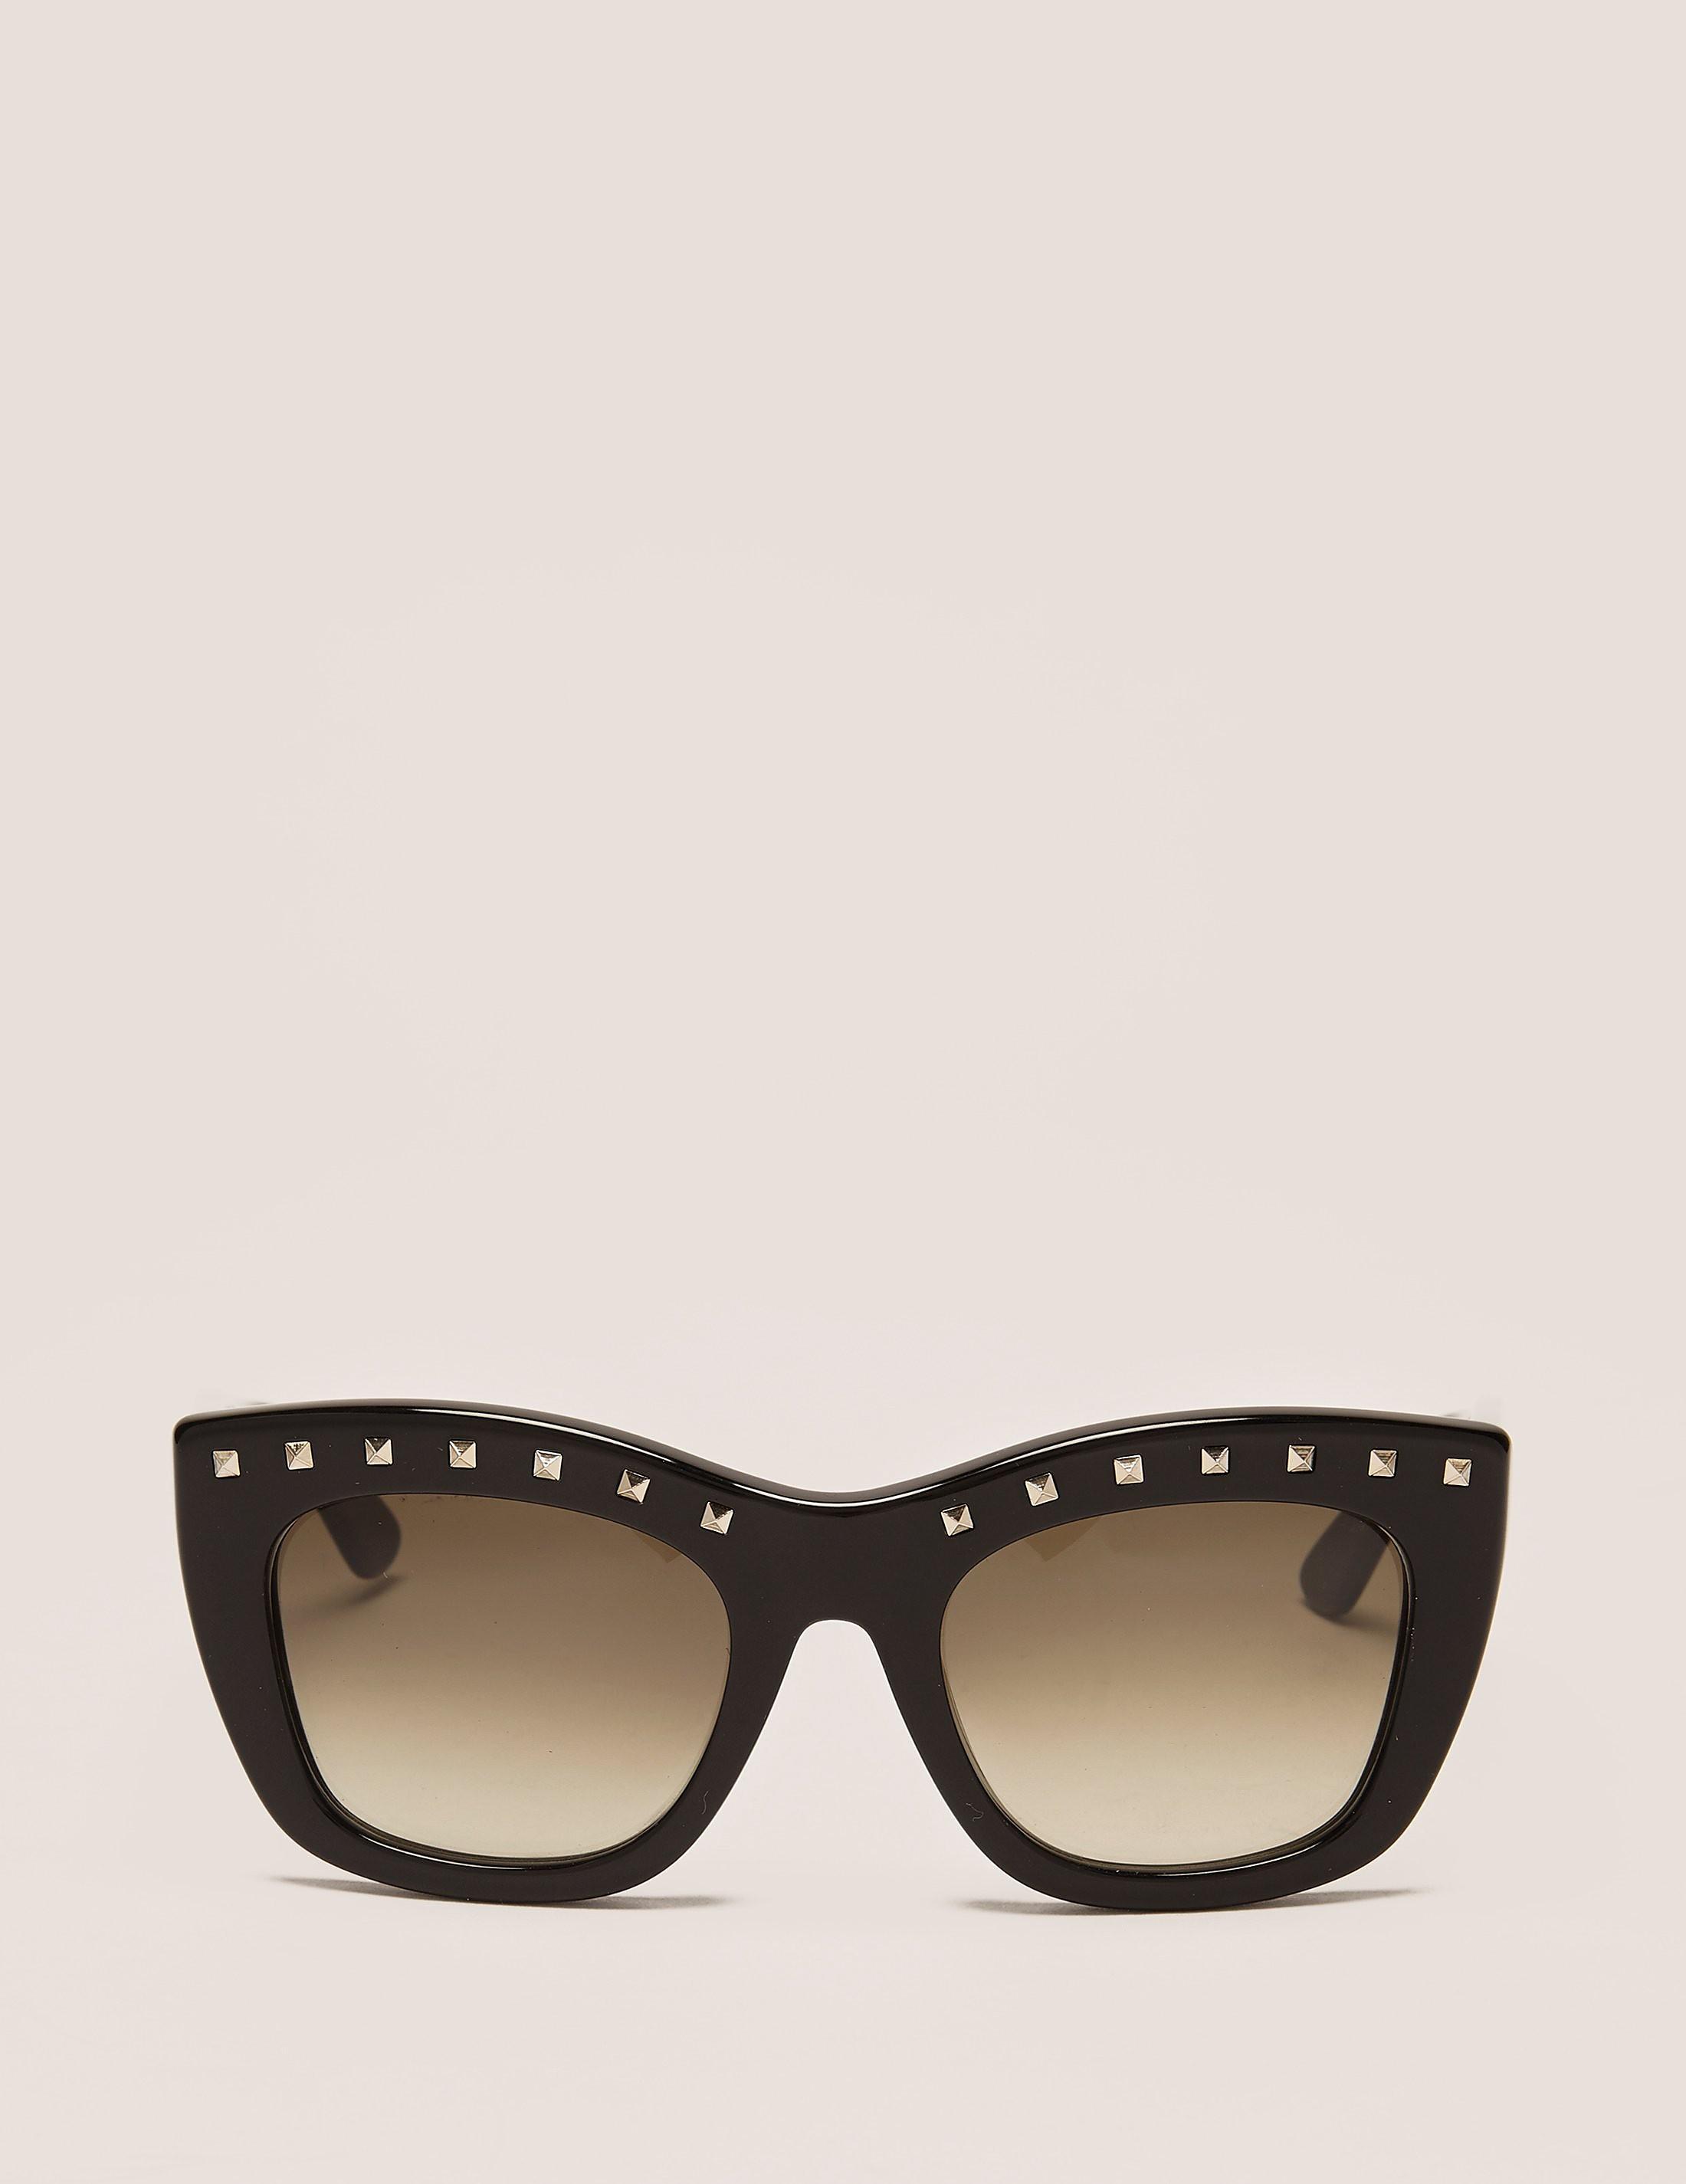 Valentino Stud Sunglasses